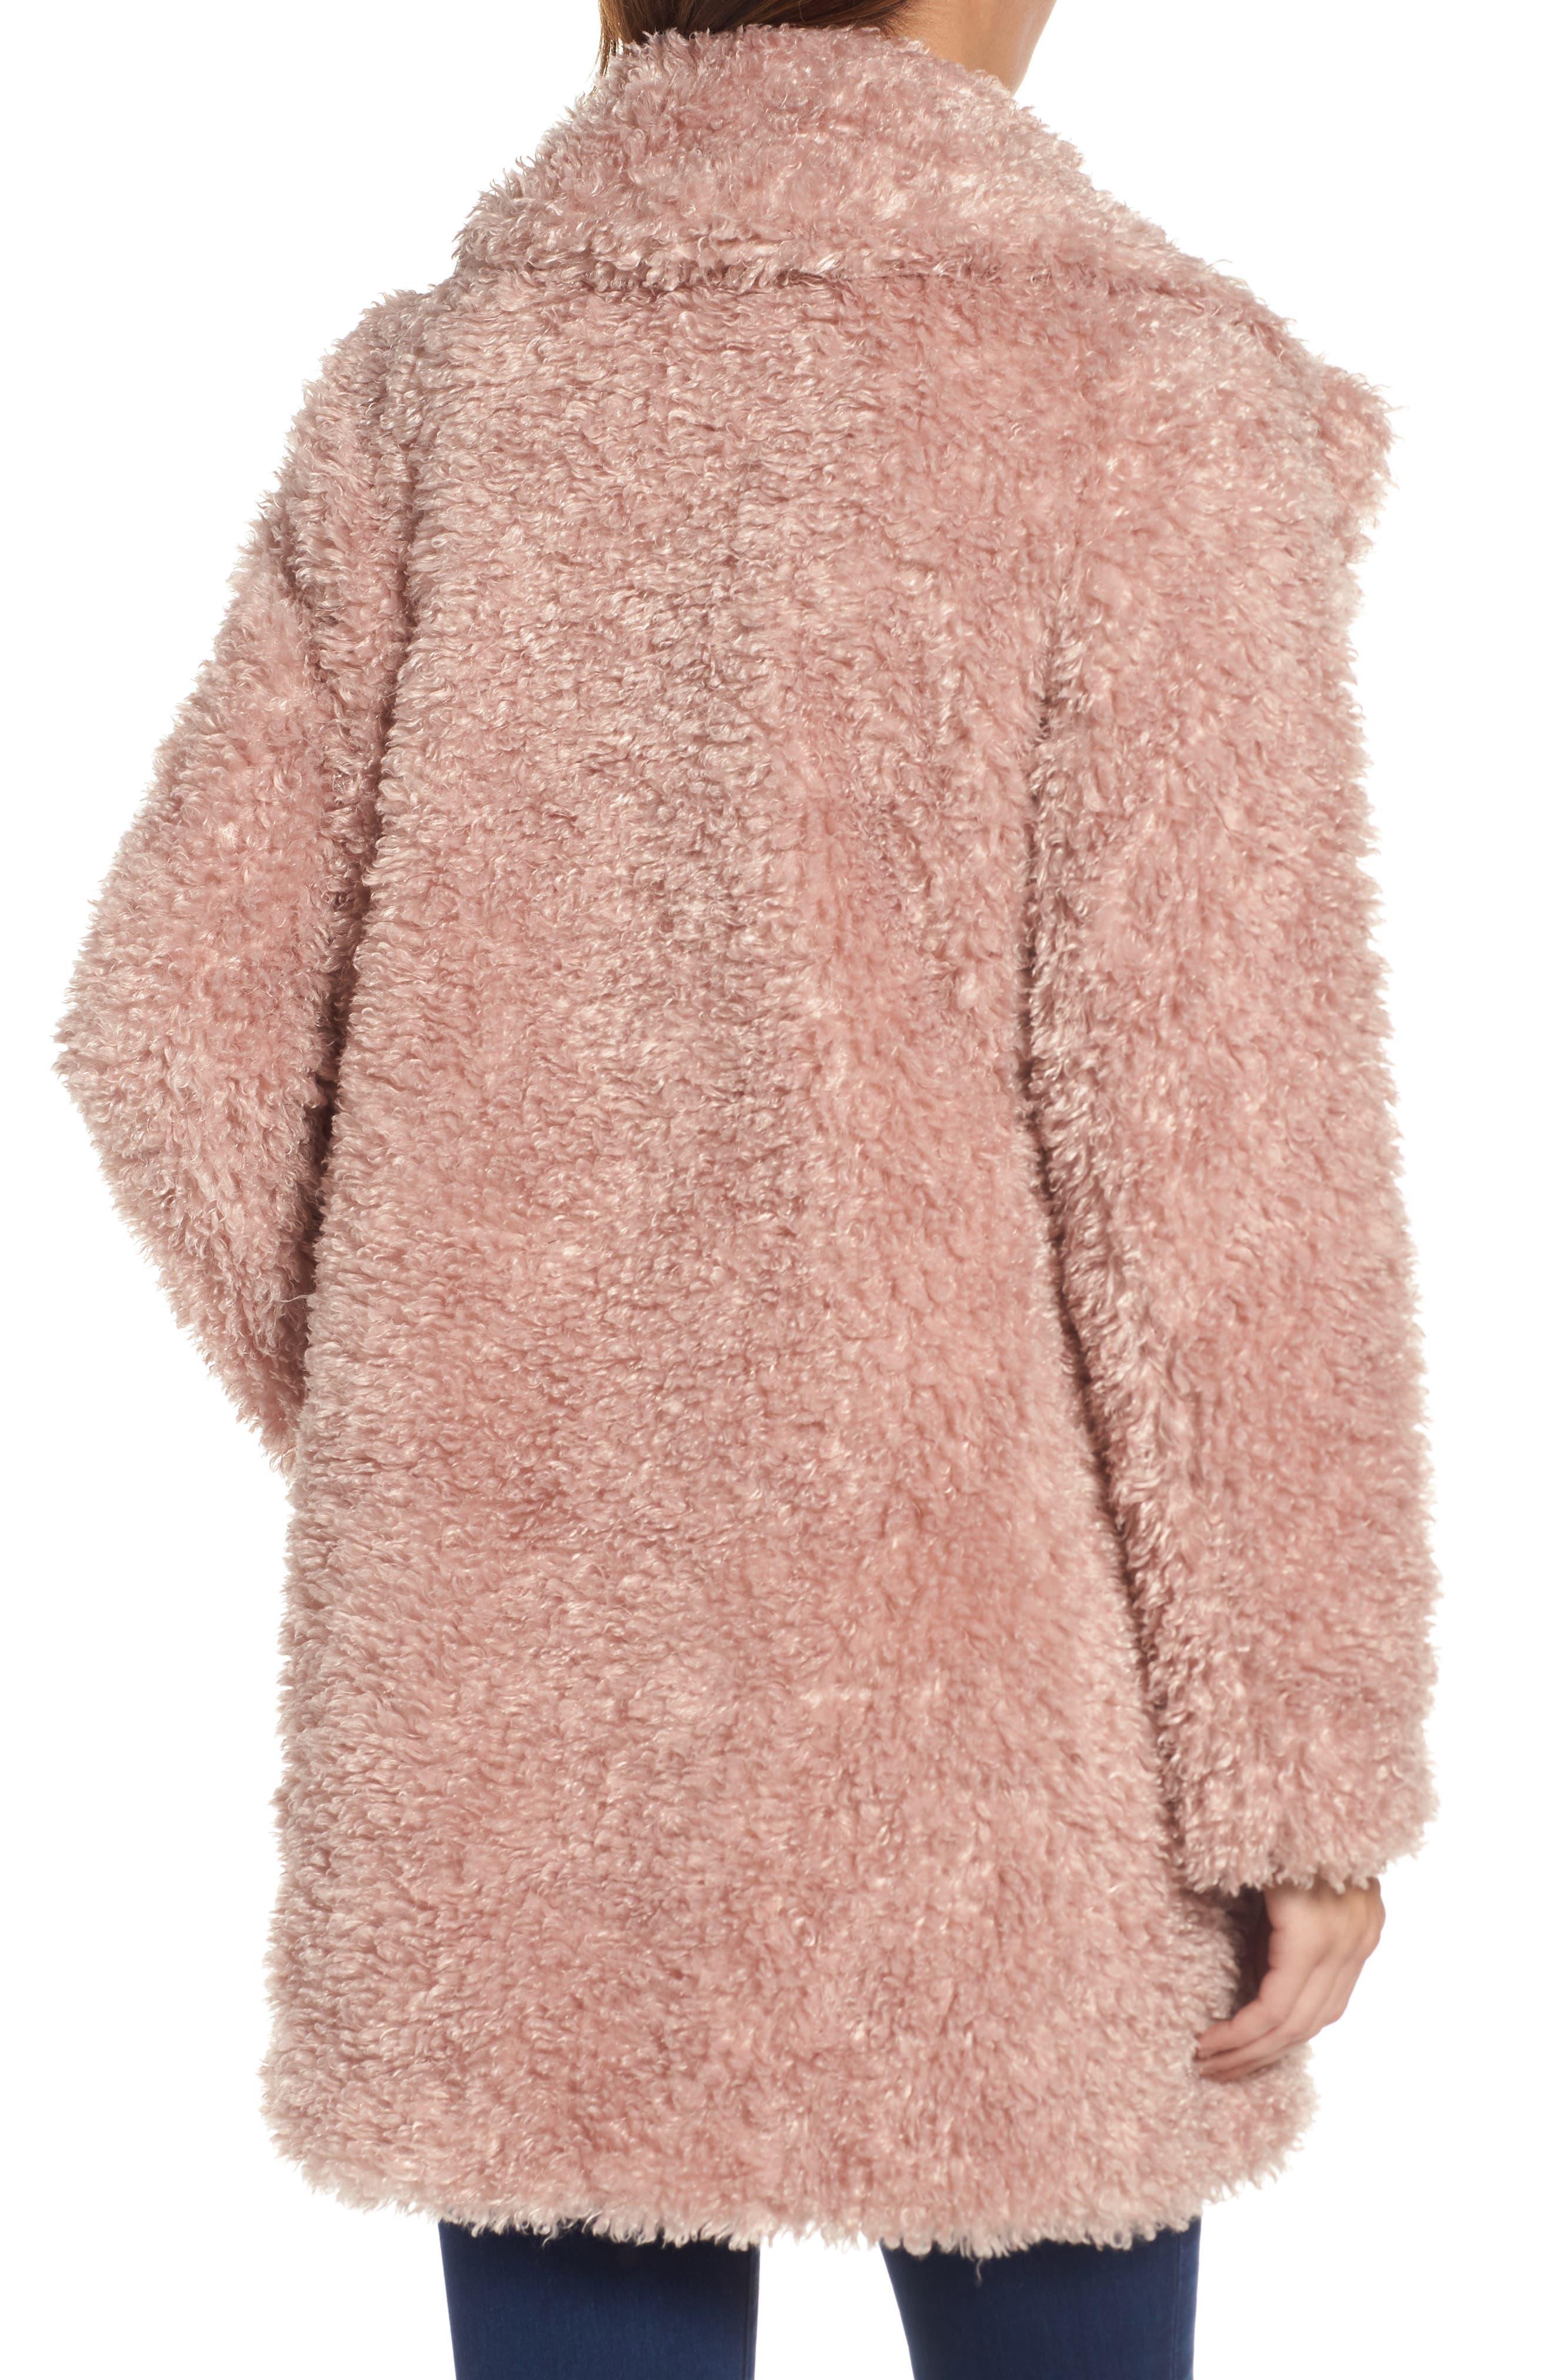 'Teddy Bear' Notch Collar Reversible Faux Fur Coat,                             Alternate thumbnail 9, color,